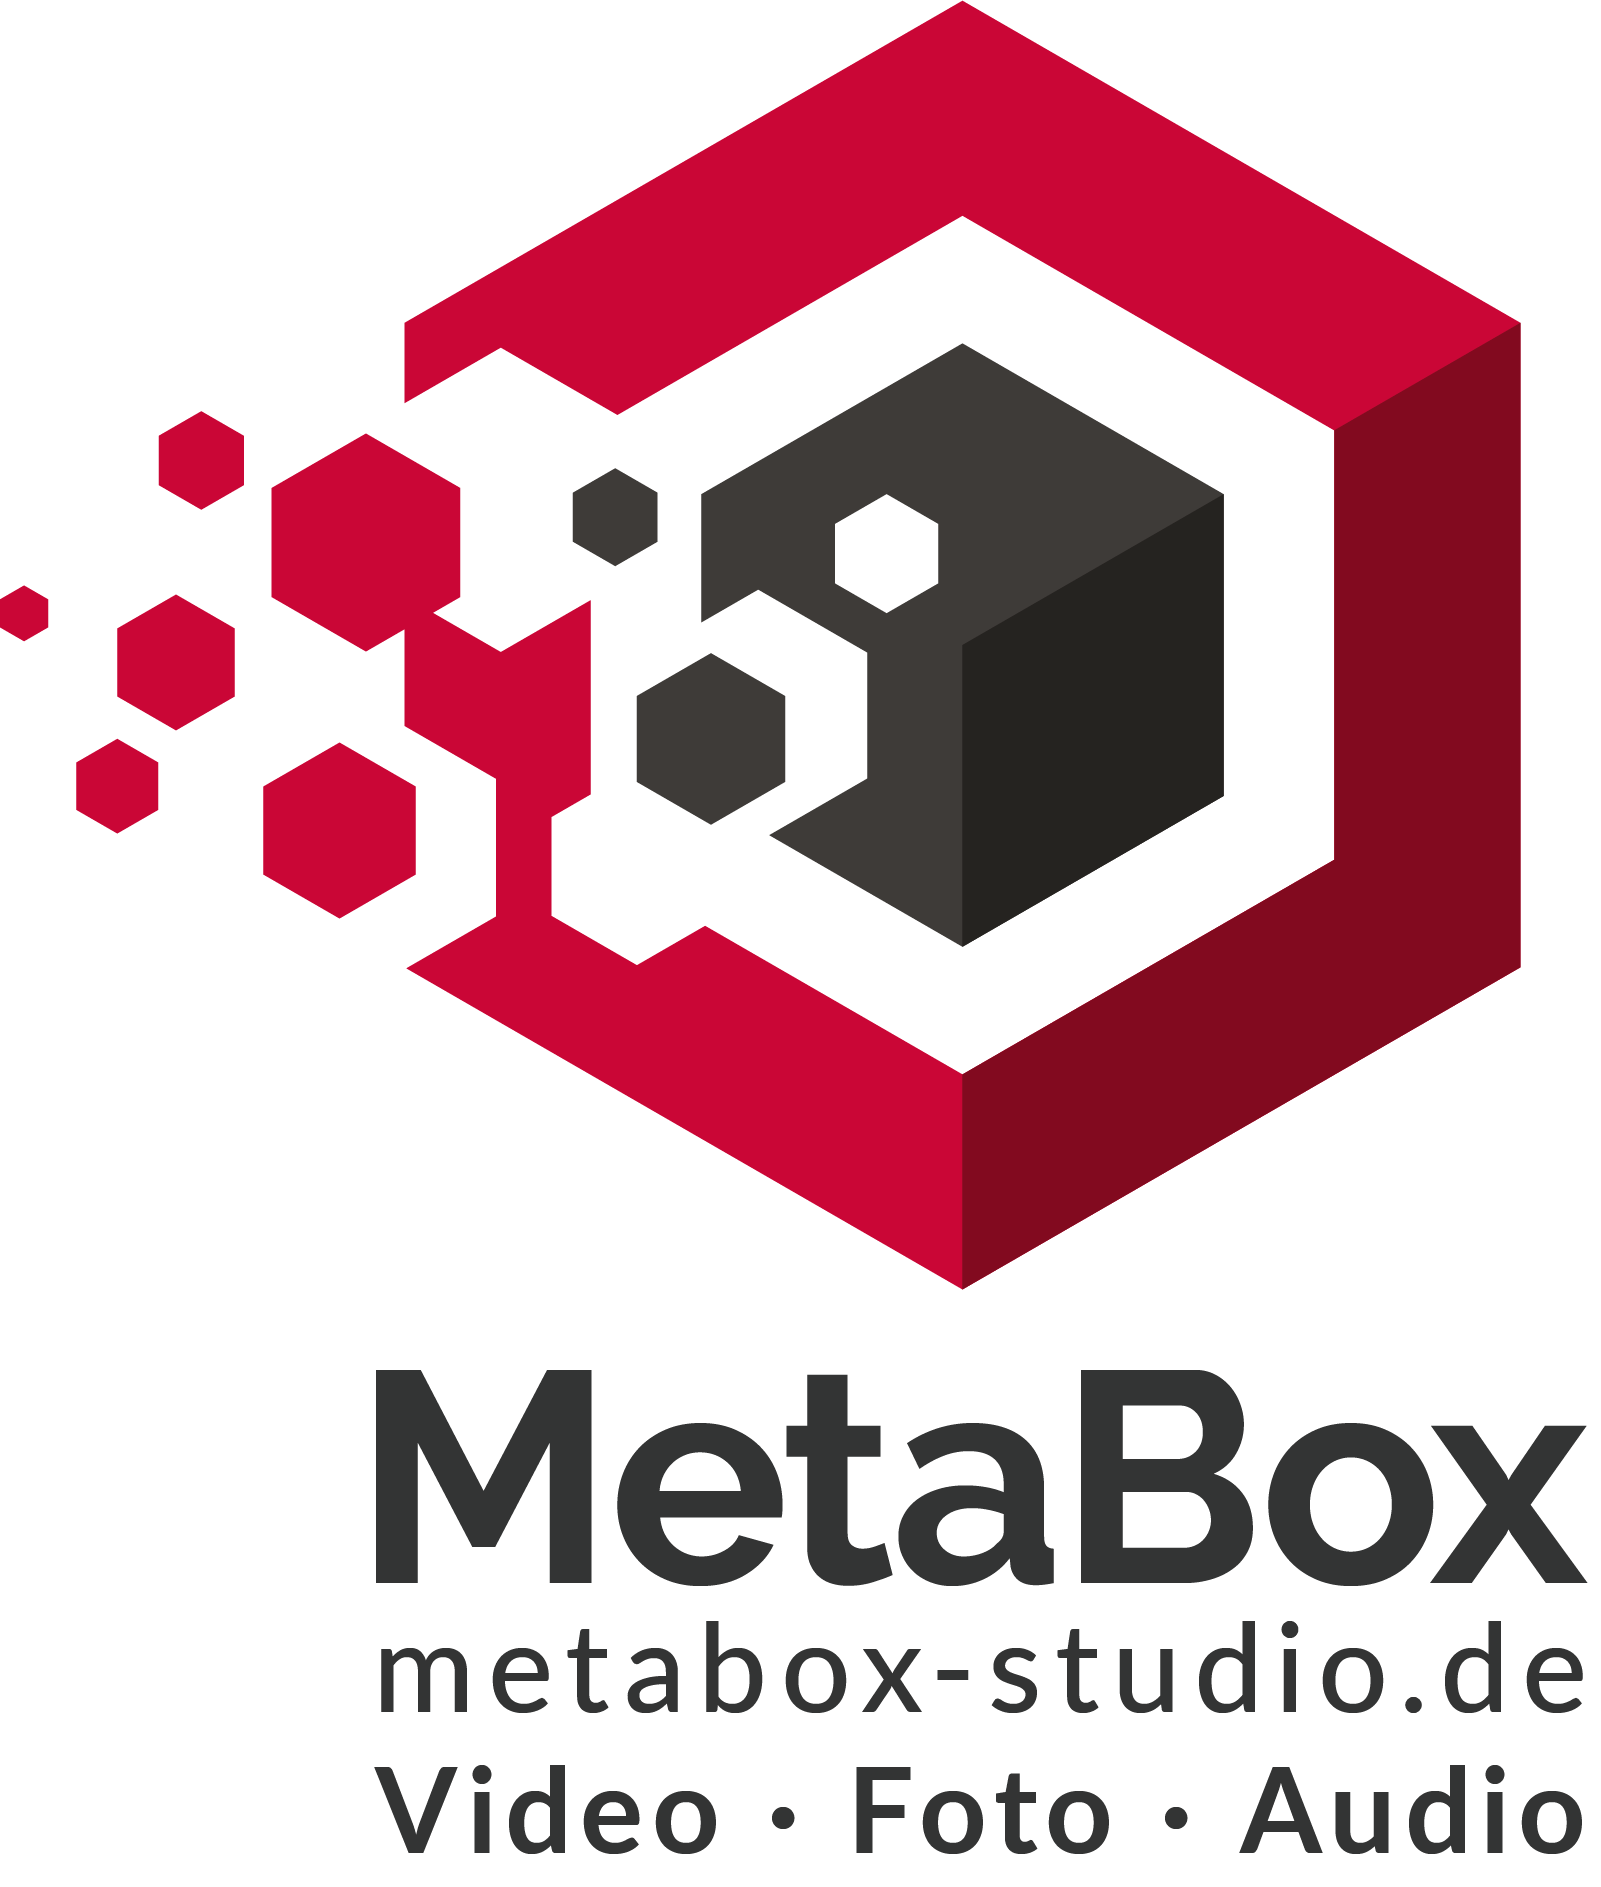 Logo mit Claim metabox-studio.de